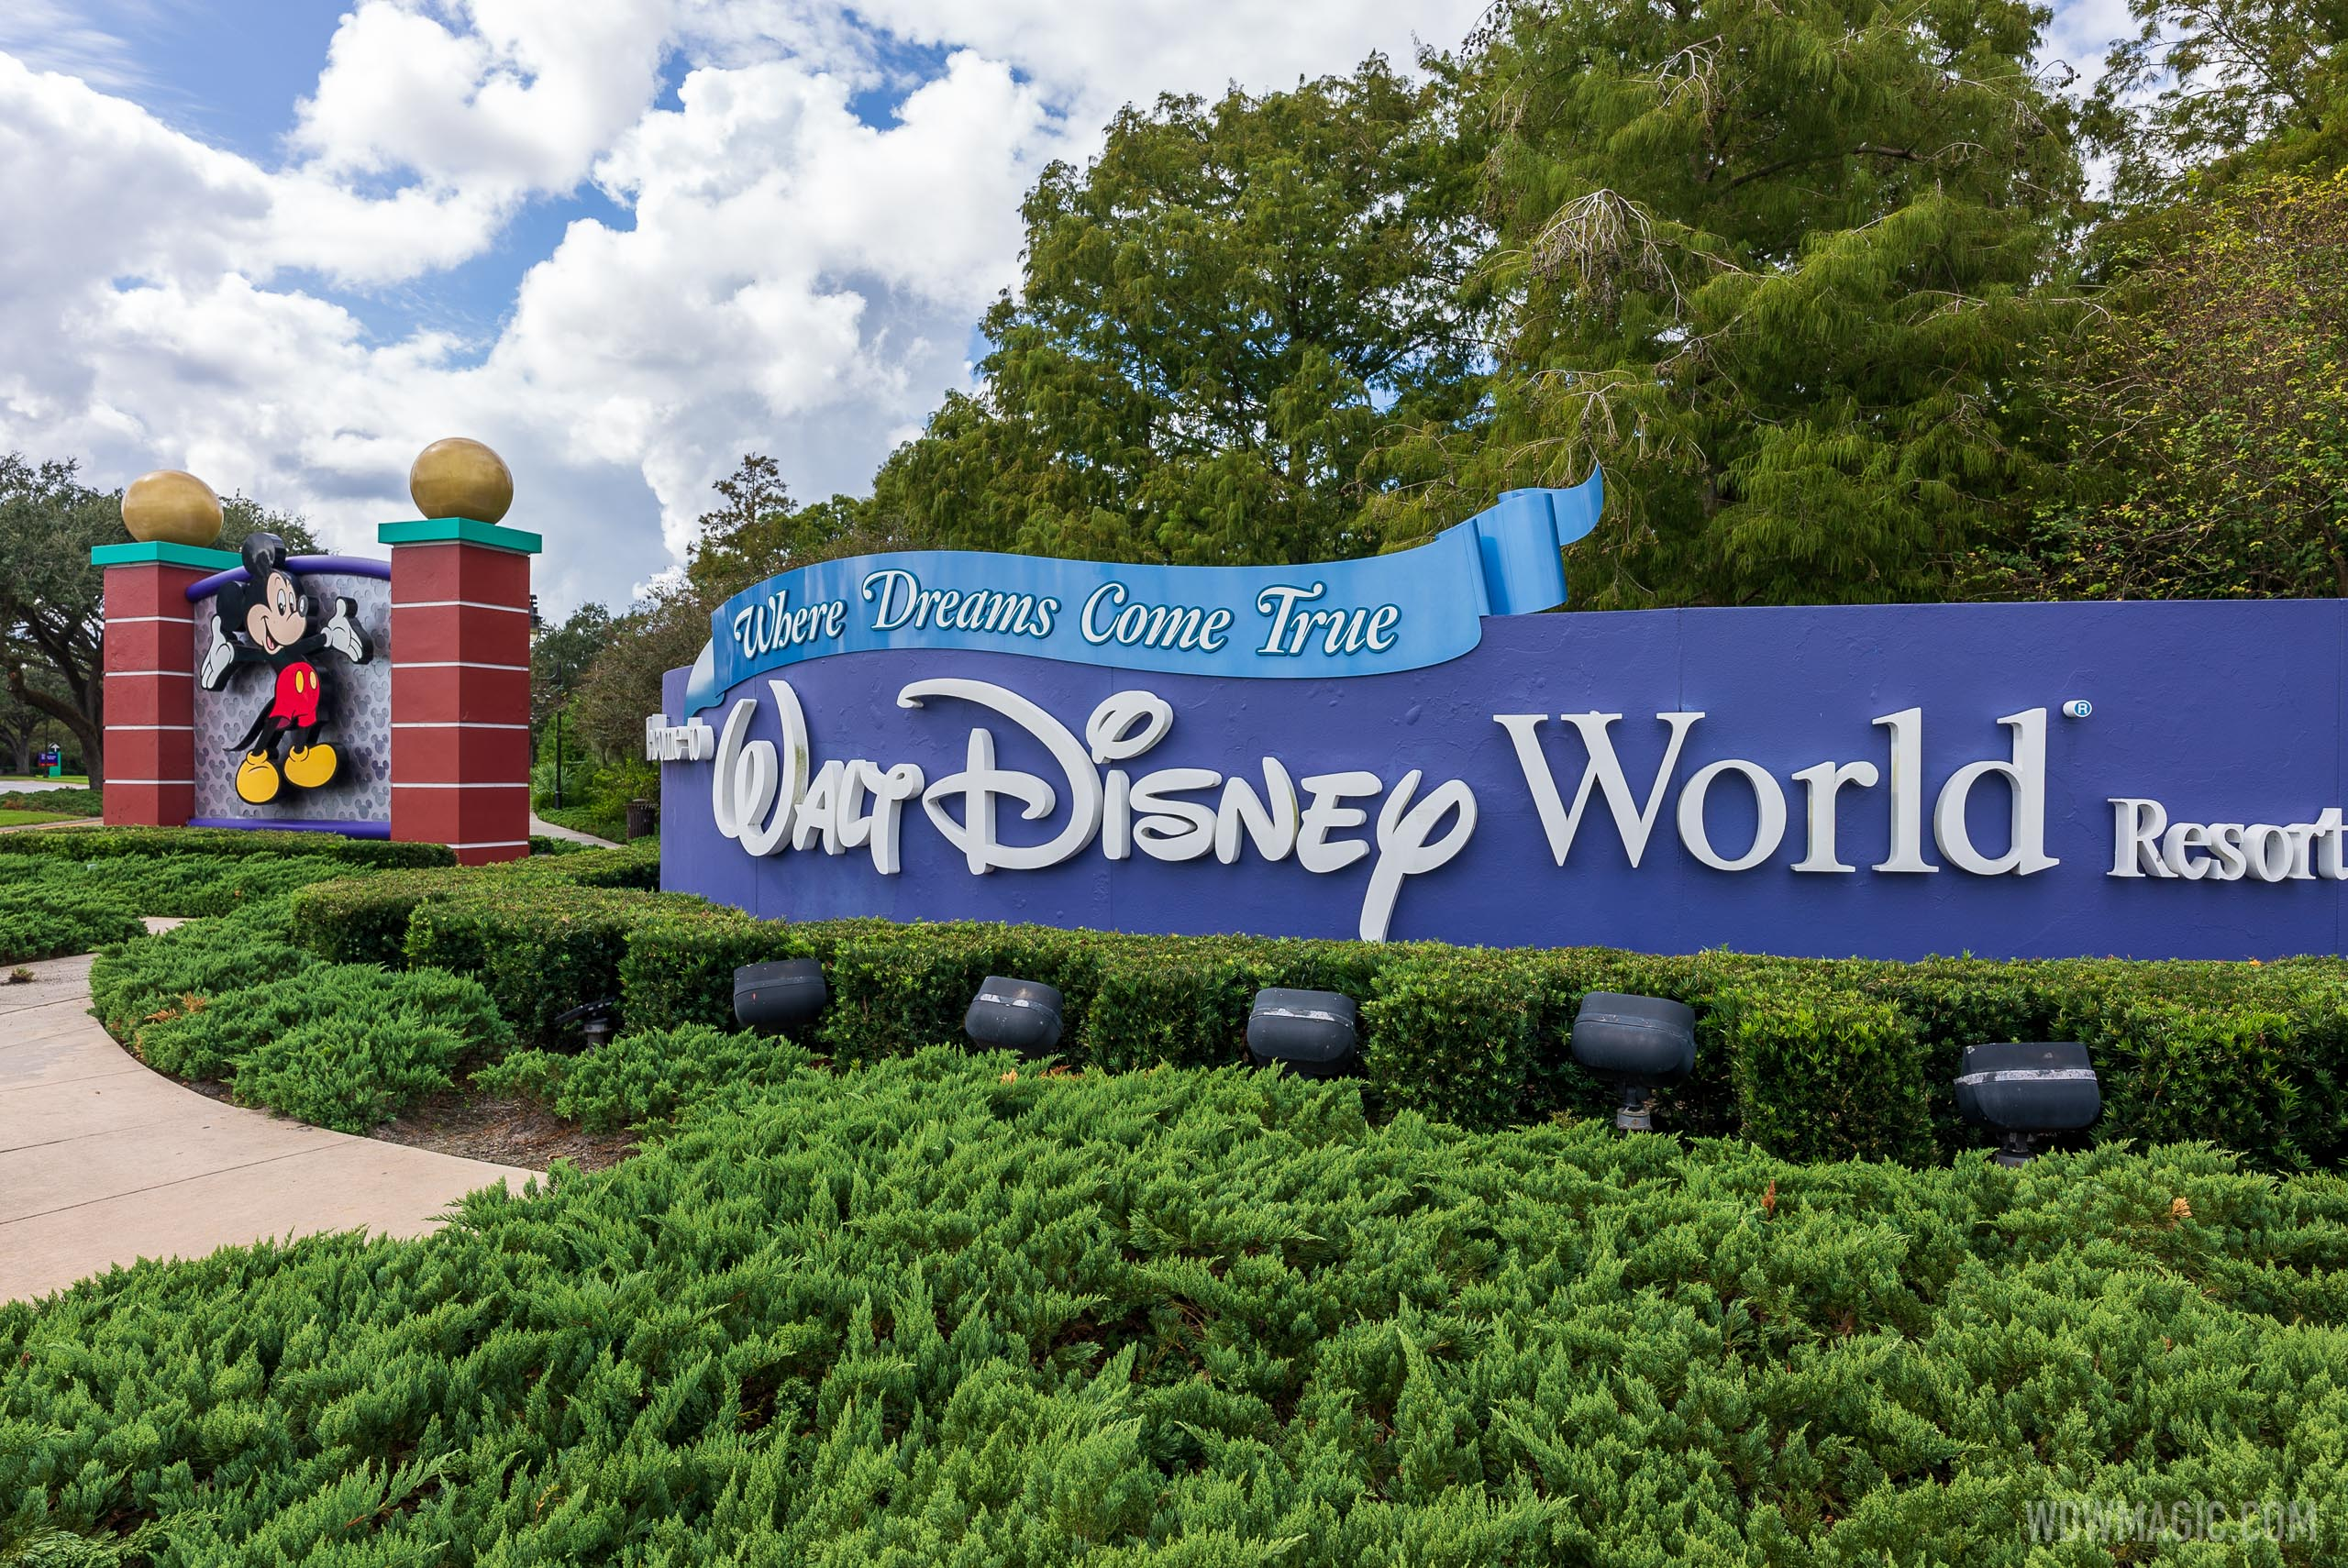 Walt Disney World Hotel Plaza Blvd gateway entrance